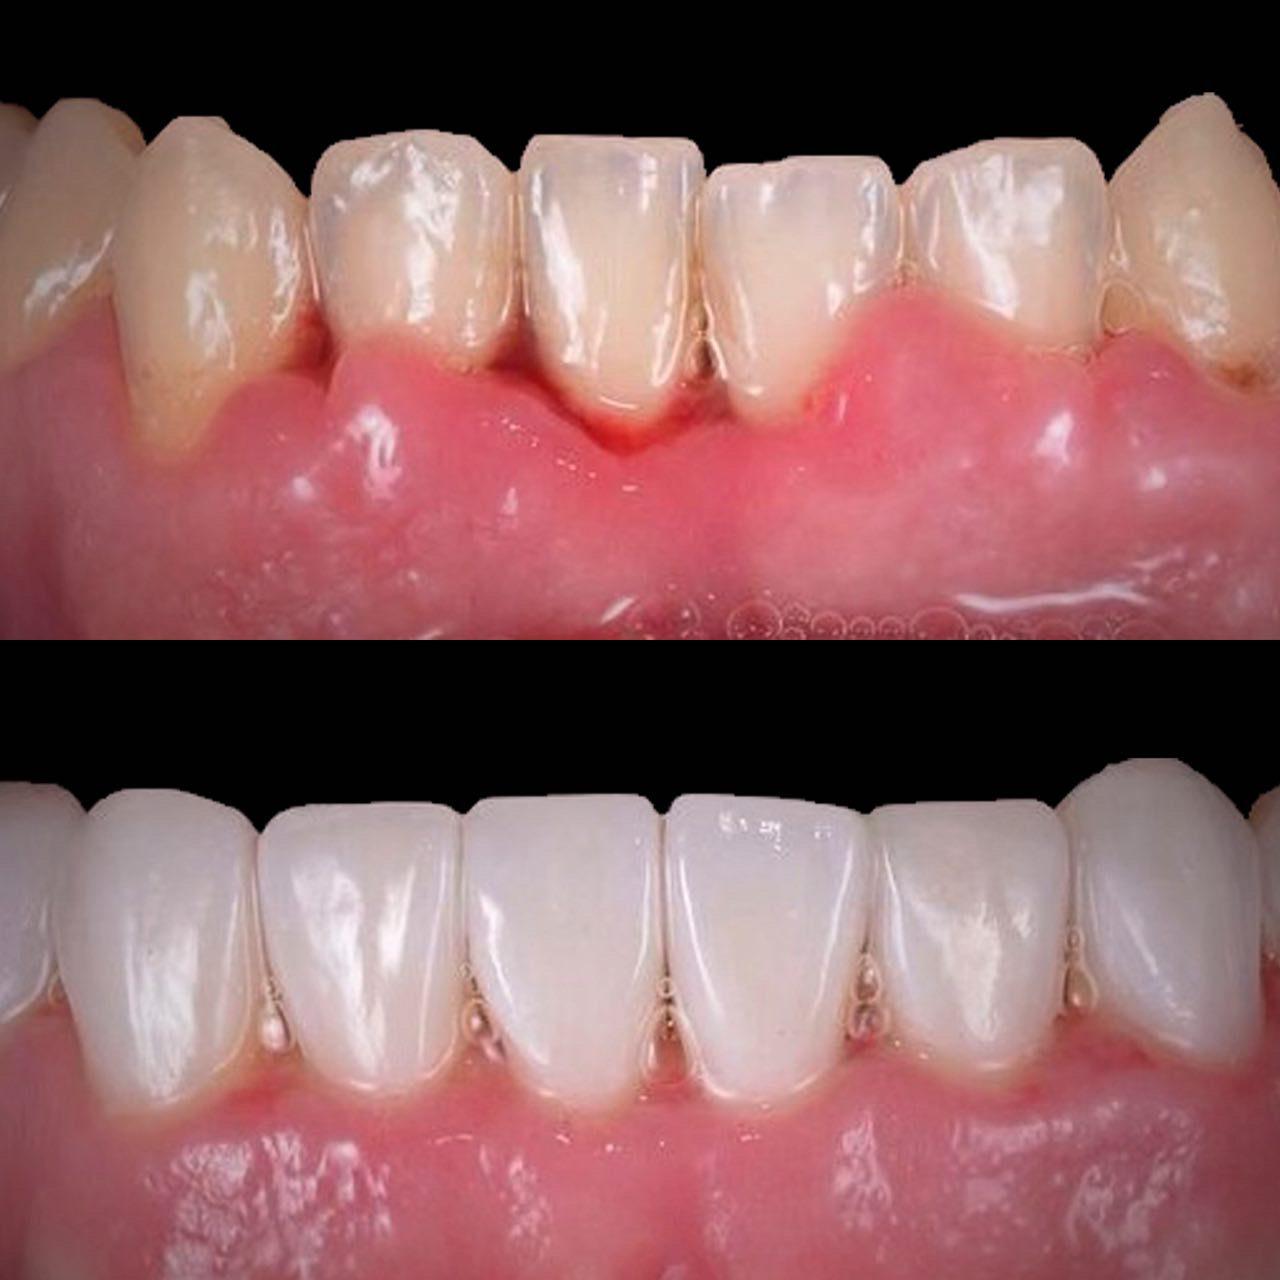 IMG FB2FAF4CA8C8 4 rotated - Художня реставрація зубів